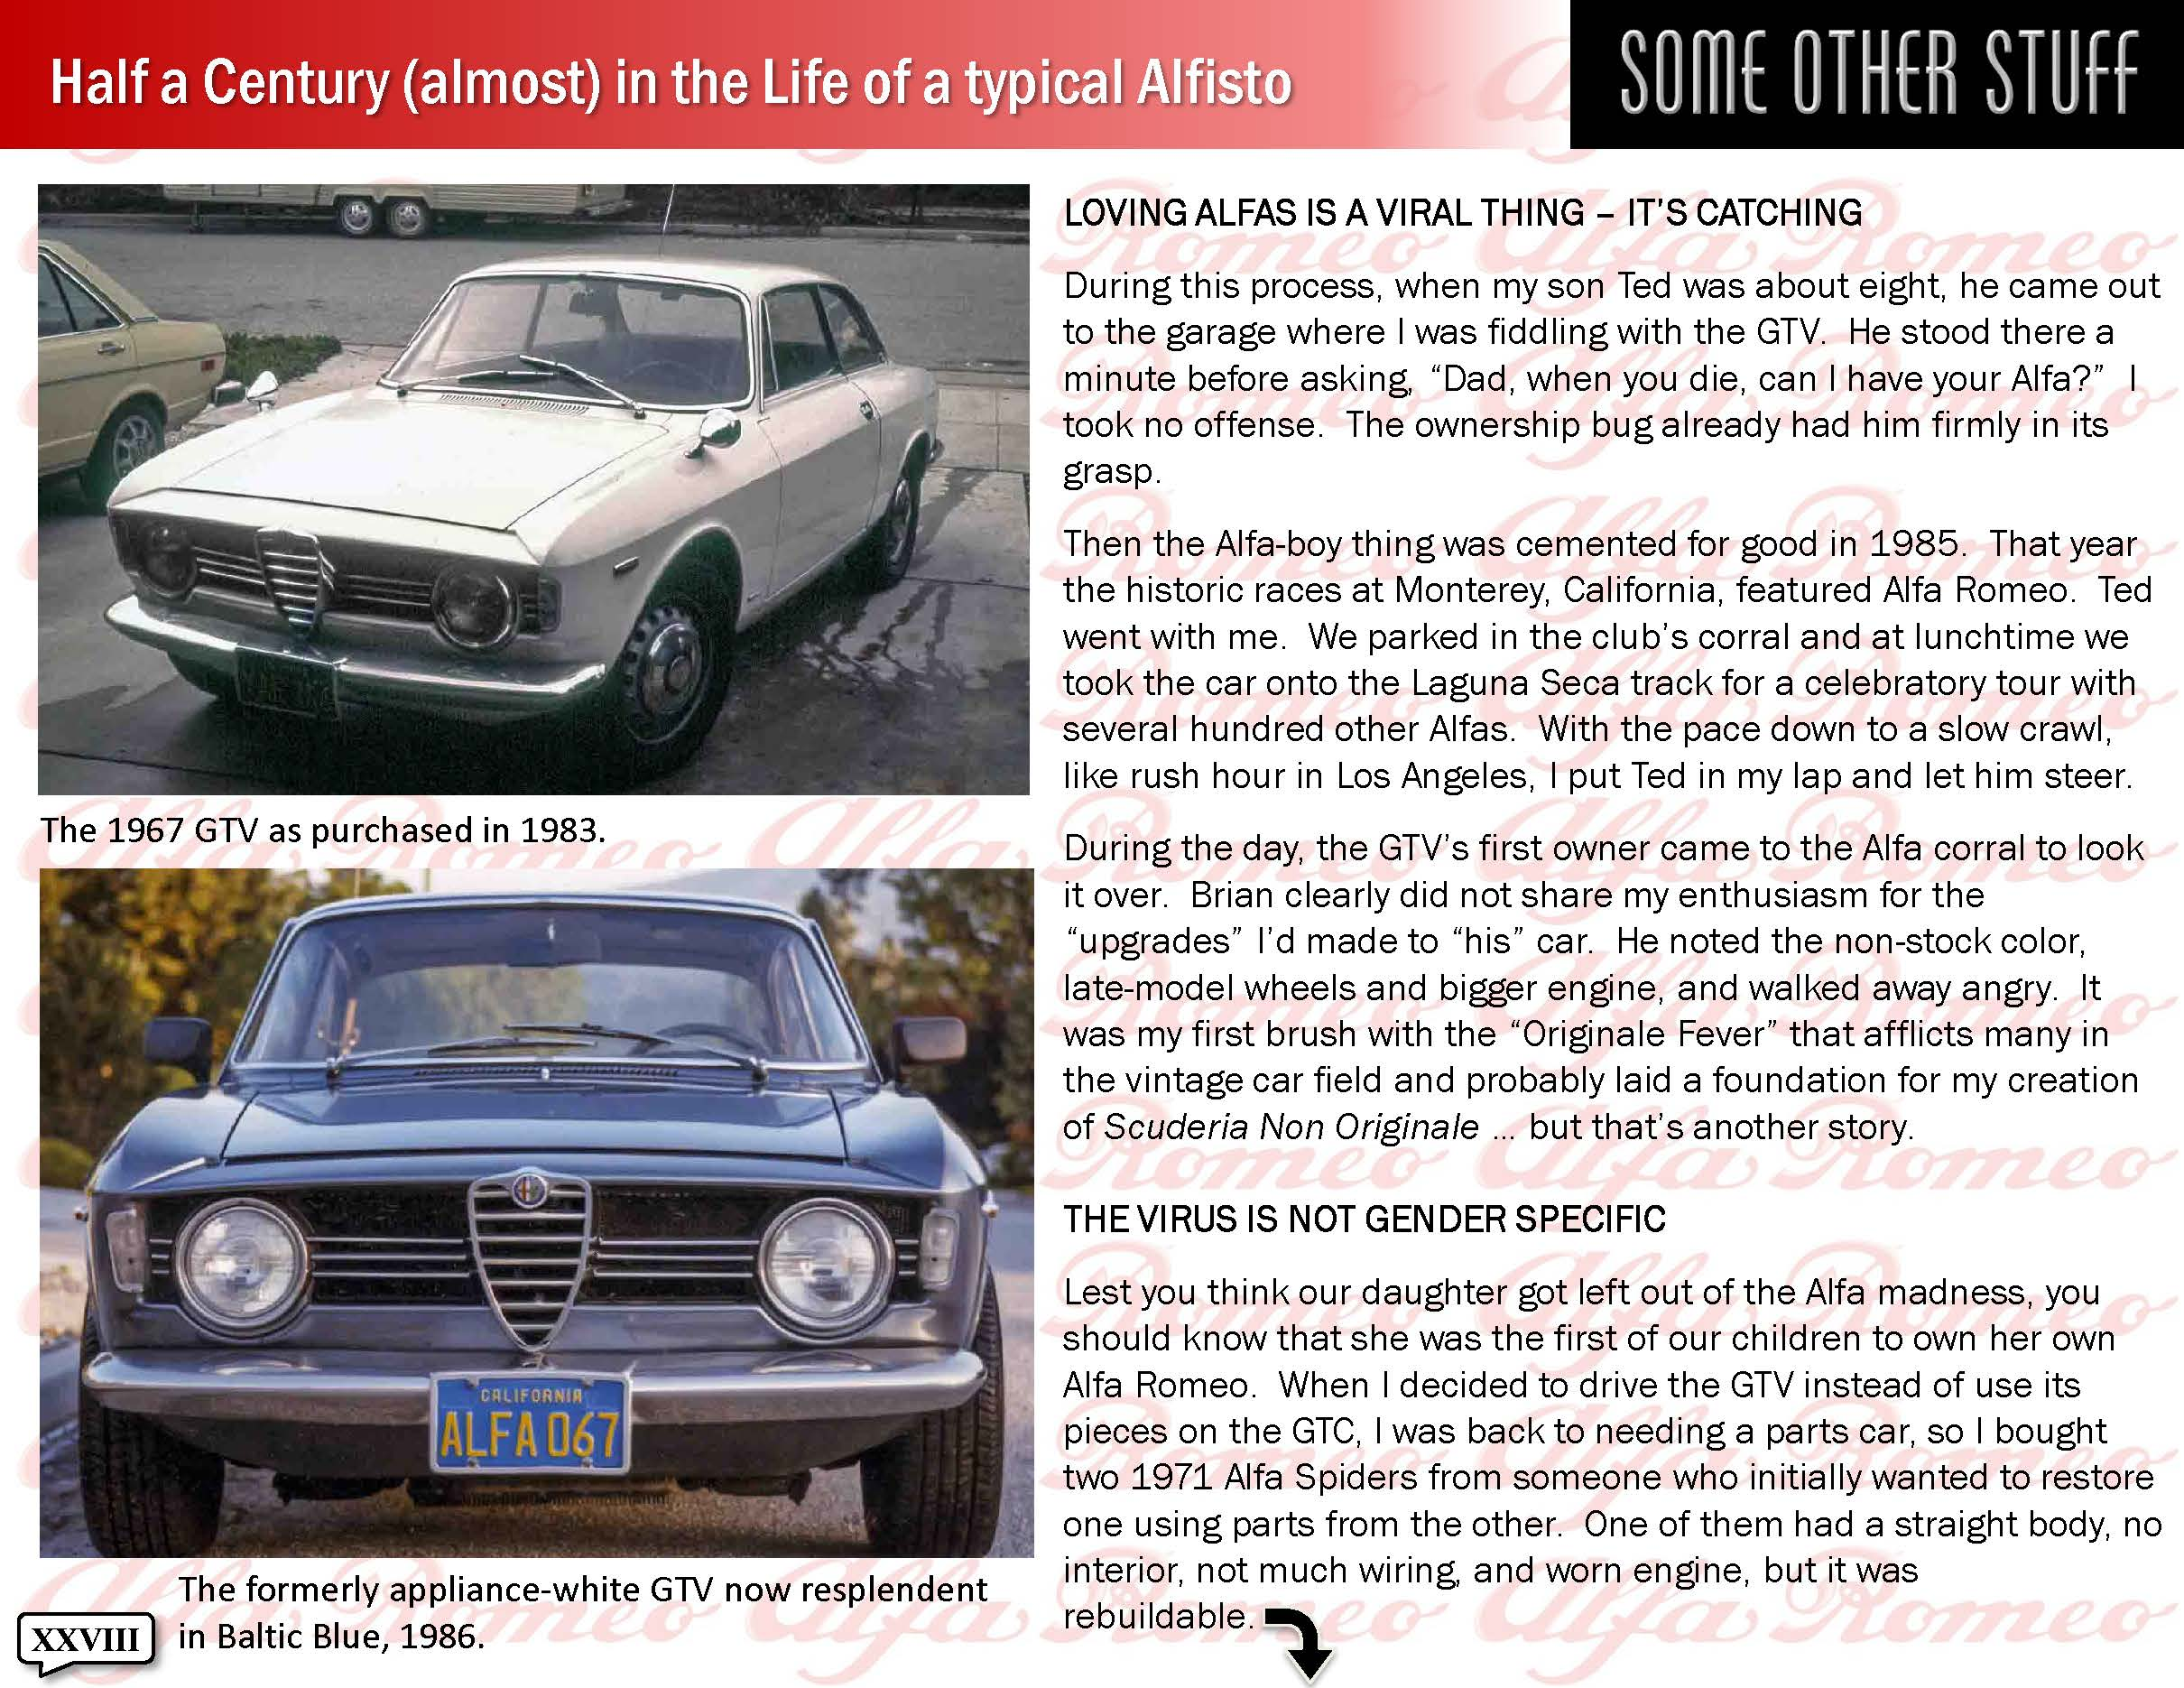 www.alfaclub.org_Newsletters_files_ALFA BITS 2014 02_Page_28